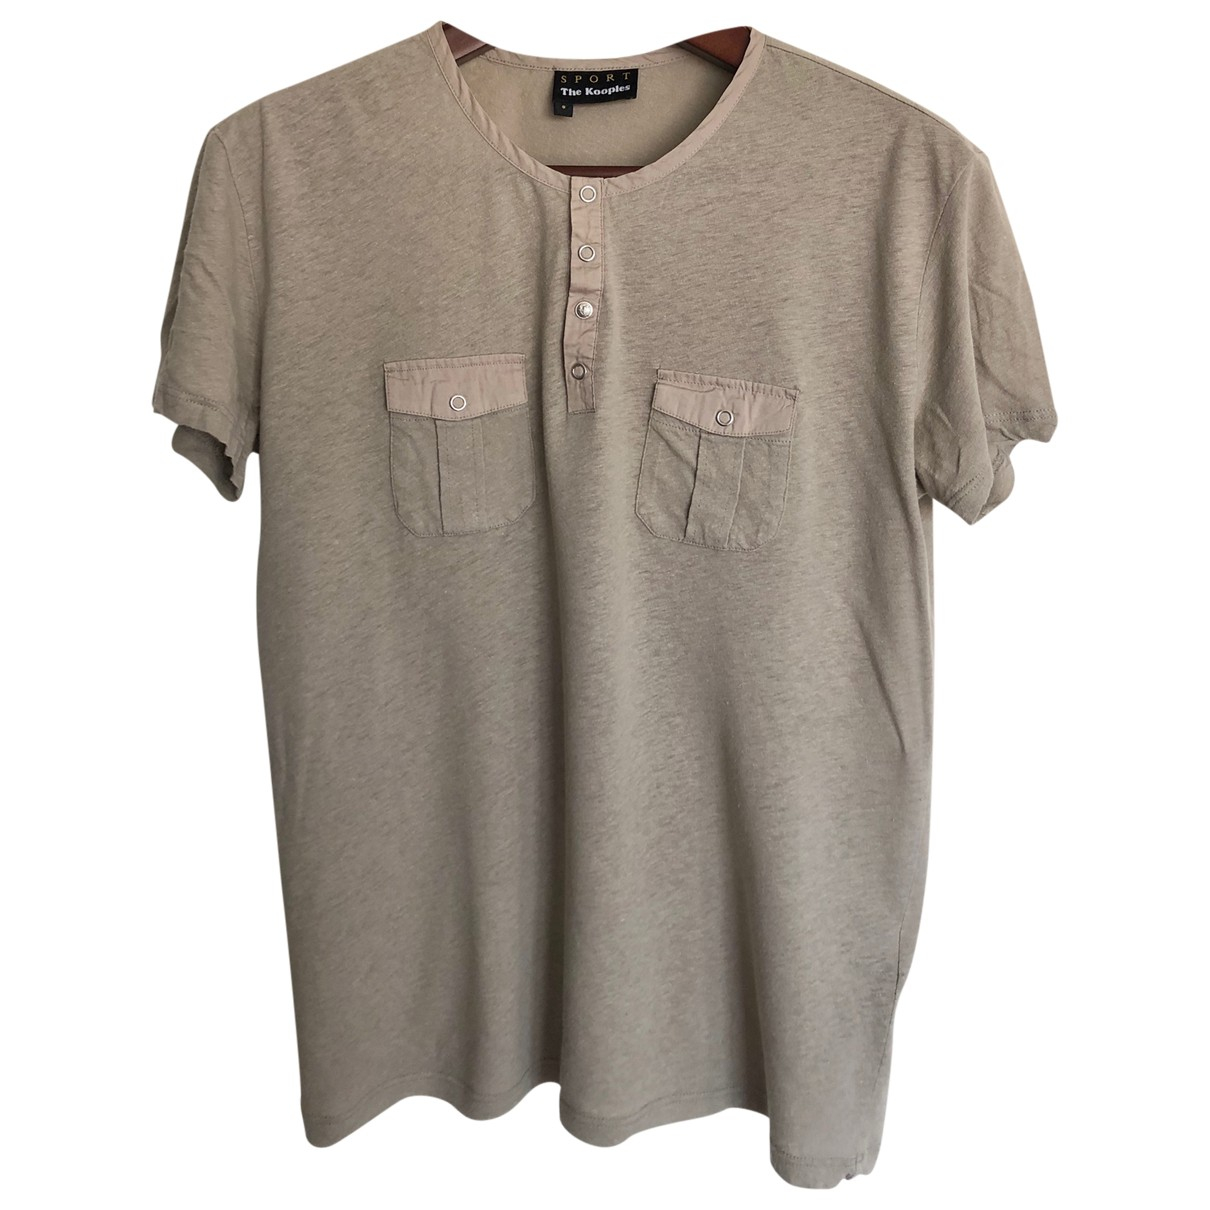 The Kooples - Tee shirts   pour homme en lin - beige